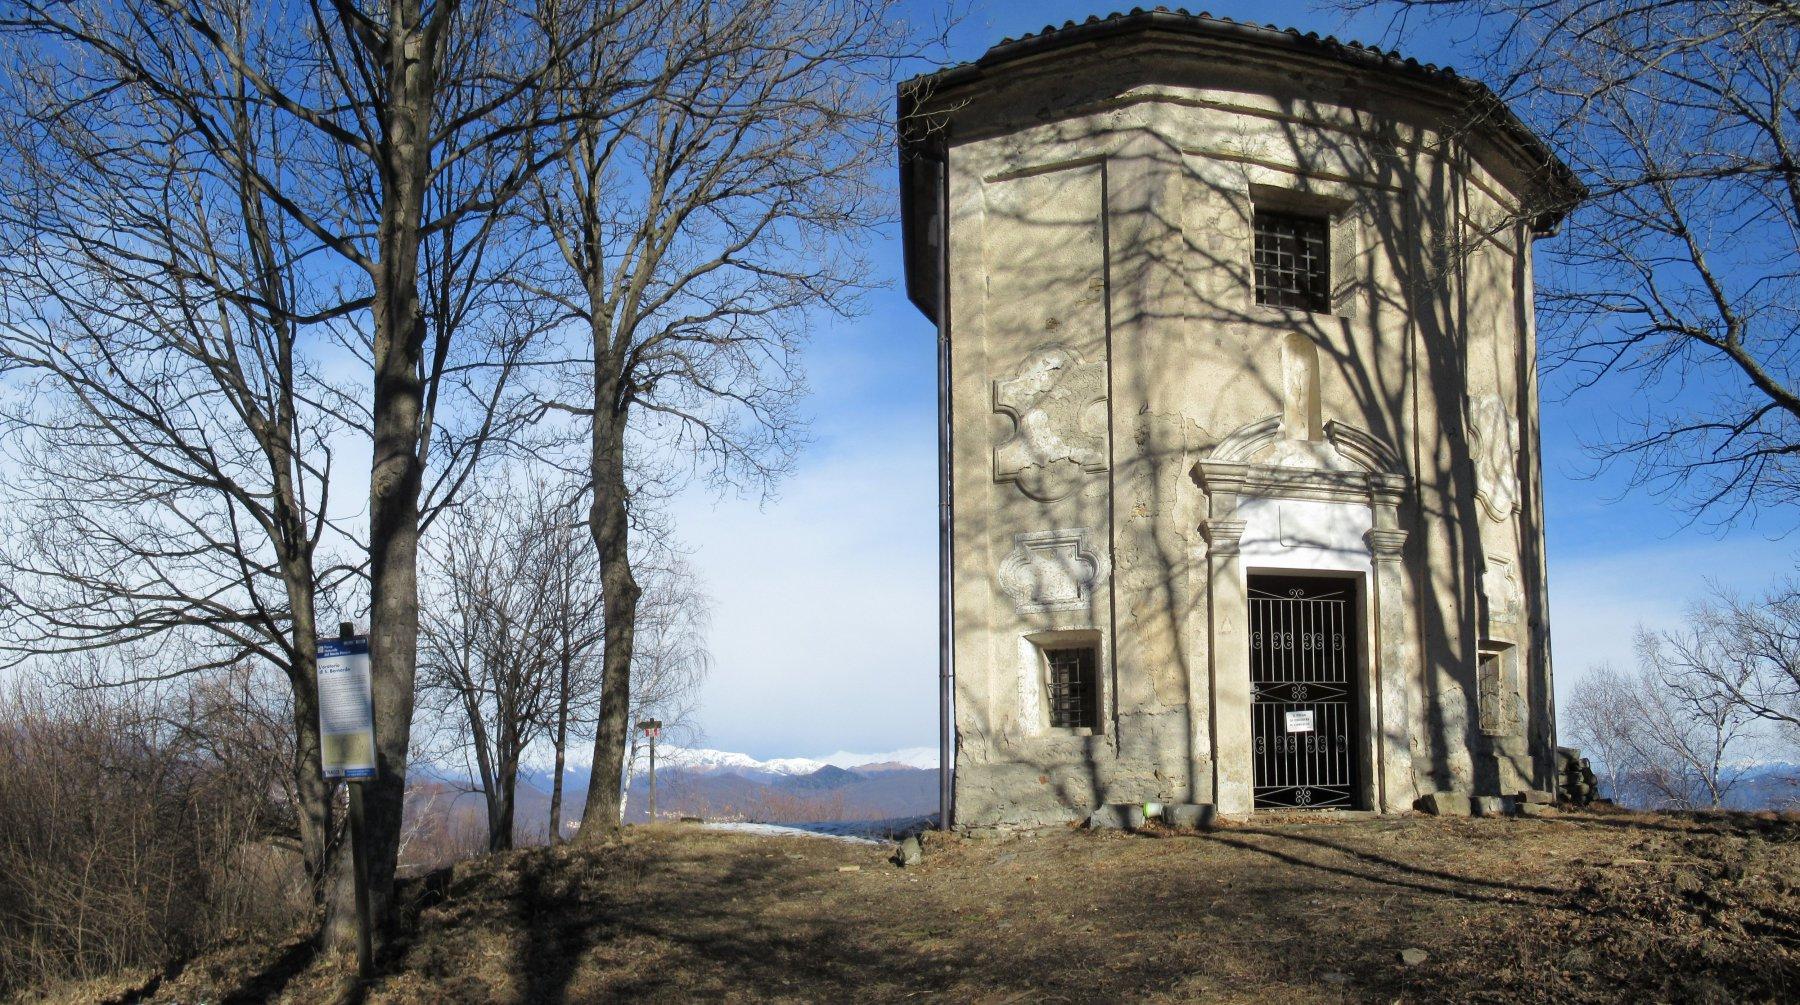 Monte Fenera m. 894 Chiesa di San Bernardo